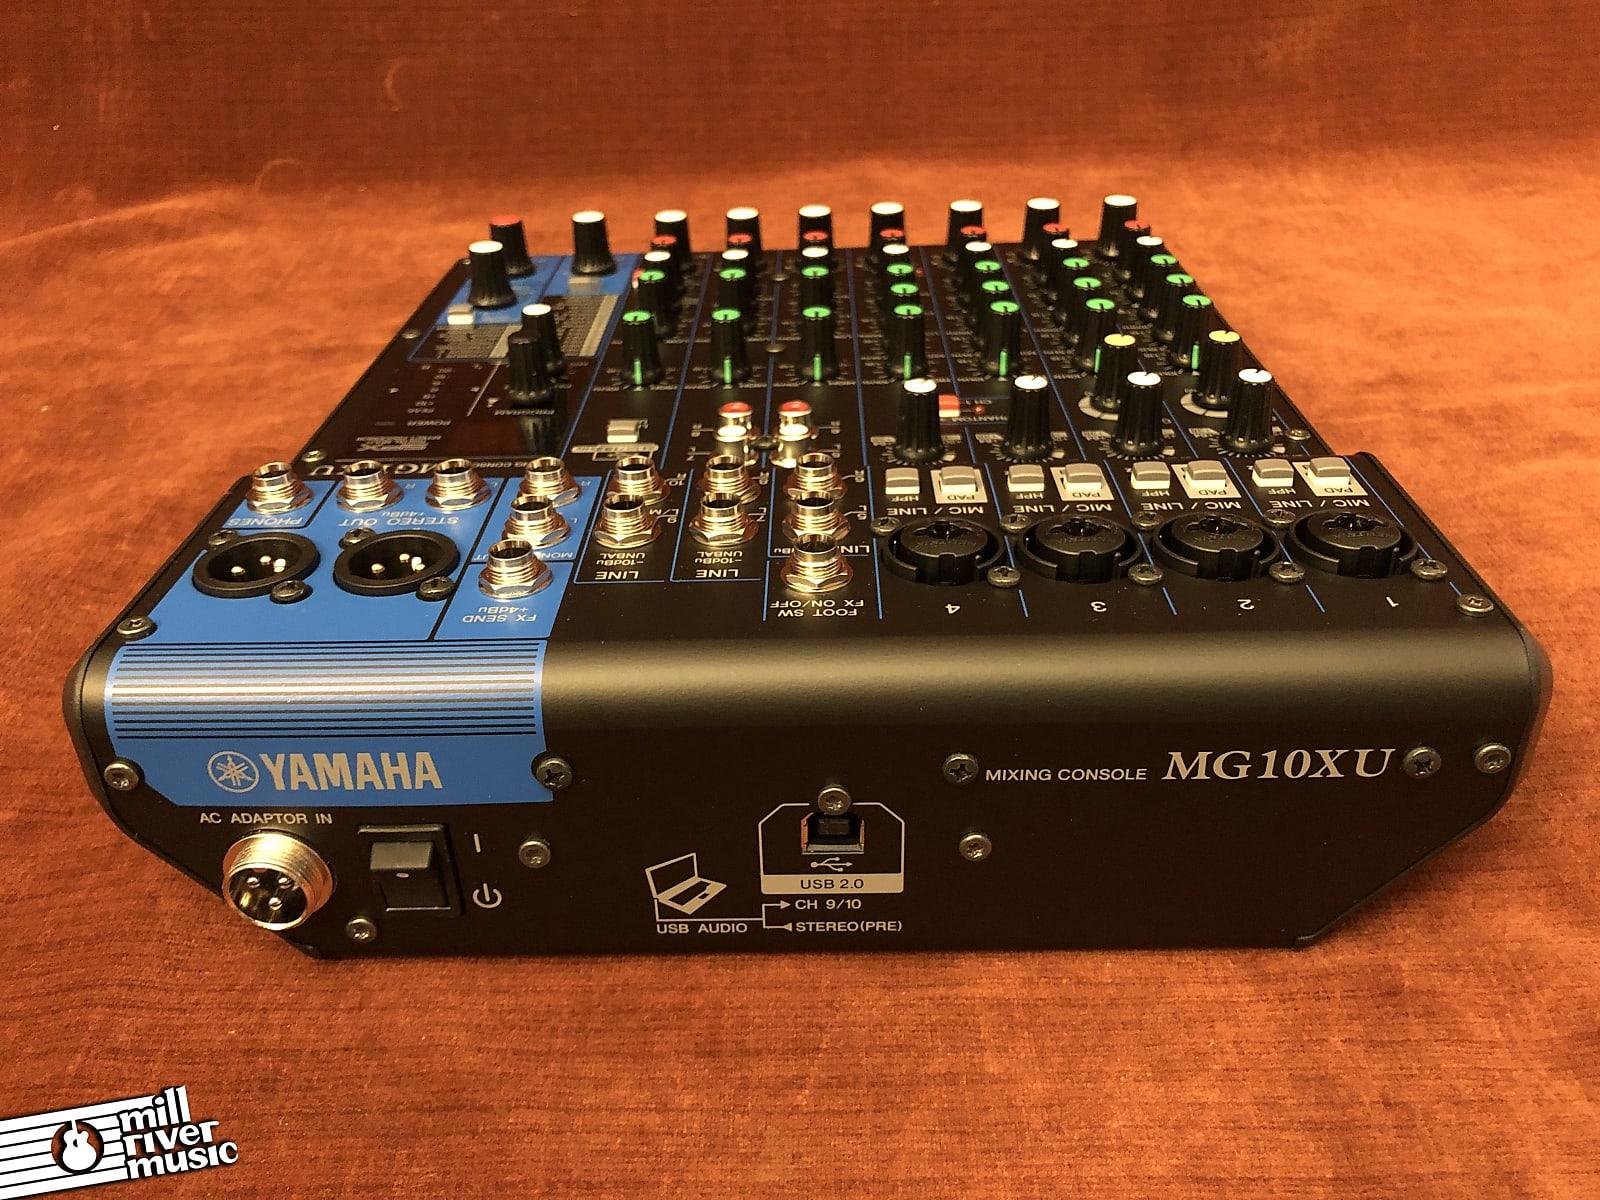 Yamaha MG10XU 10-Channel Mixer w/ USB & FX Like New